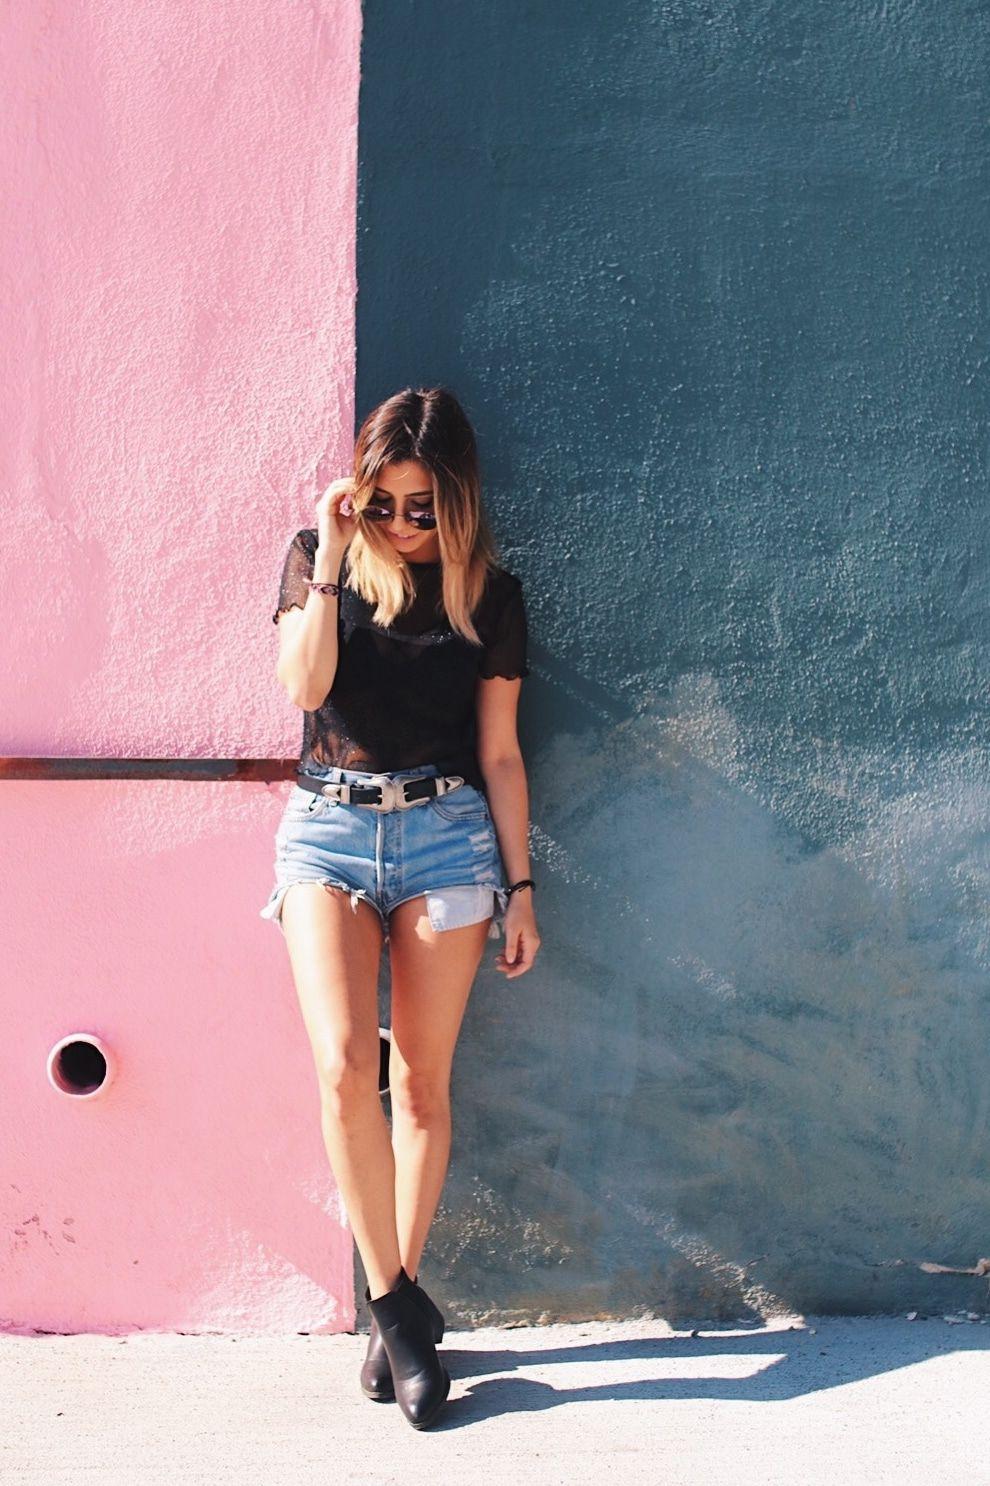 Insta Walls in LA | Shorts | Instagram wall, Insta photo ideas, Instagram pose